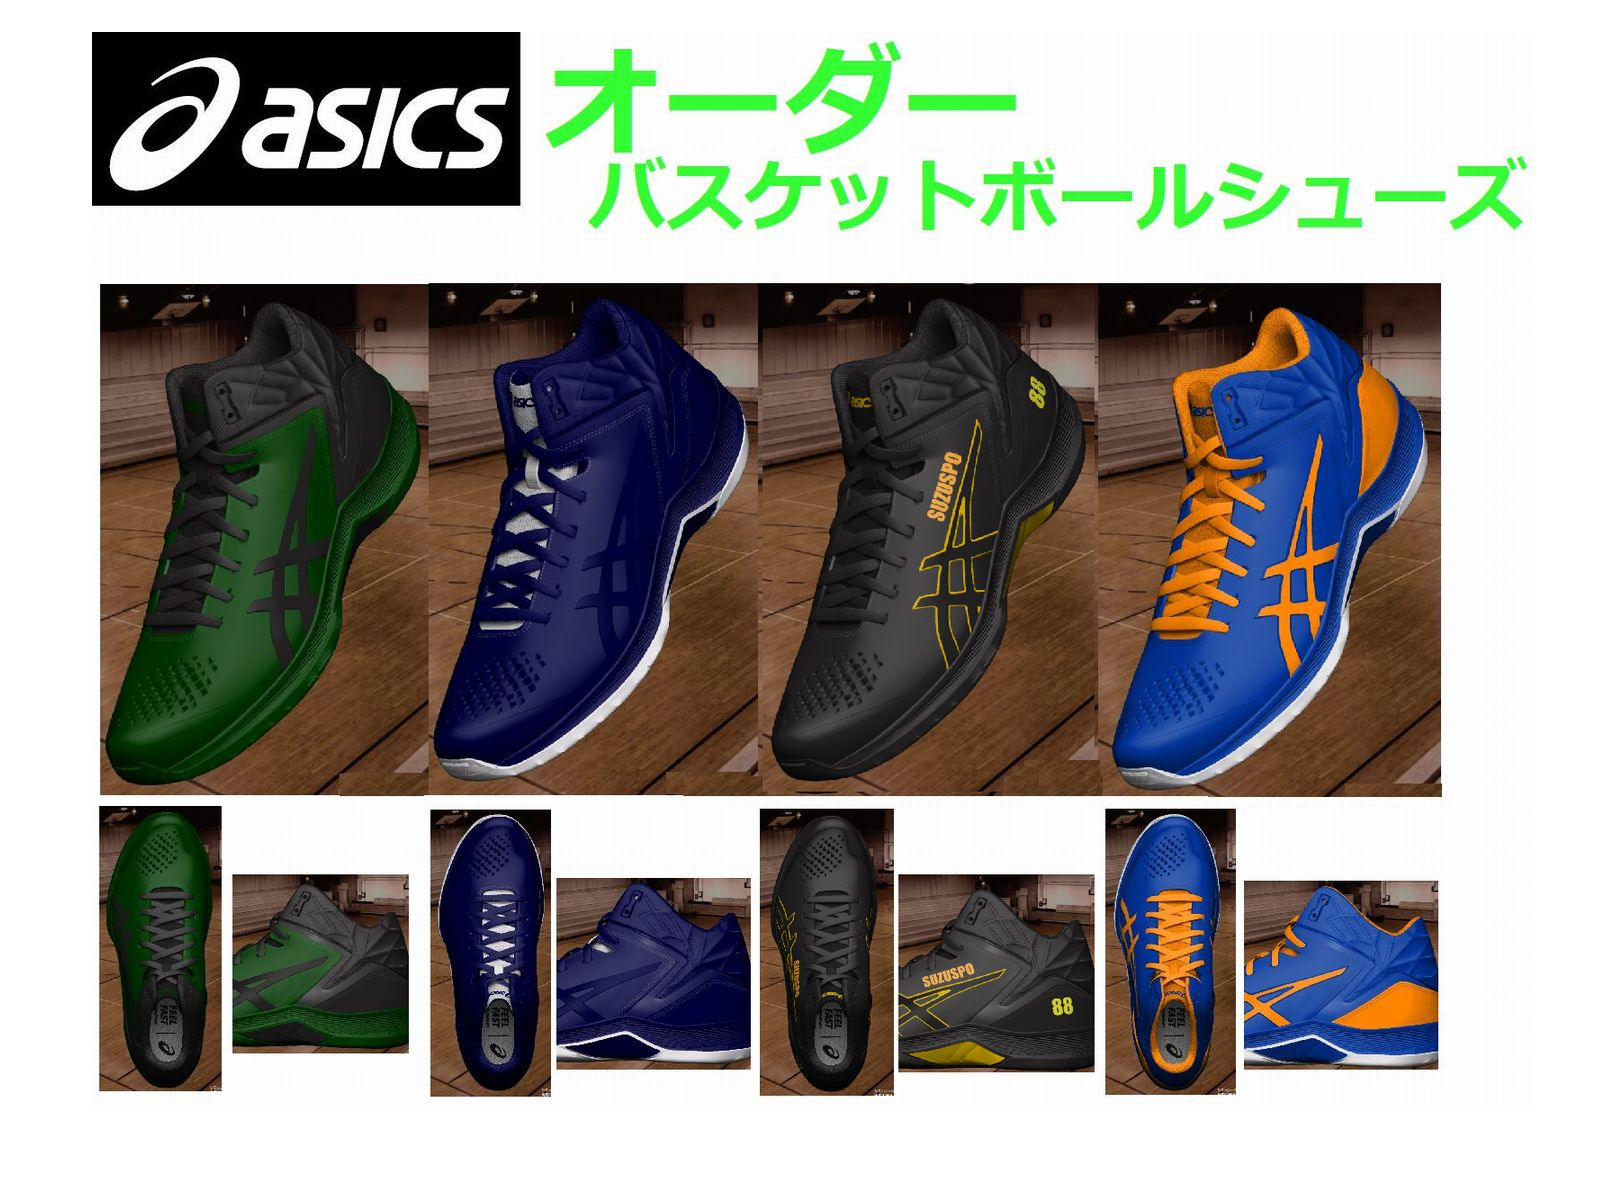 【ASICS=アシックス】バスケットボール オーダー シューズ【ASICS】CUSTOM-MADE BASKETBALL SHOES受注生産品シューズオーダー バスケットボールシューズオーダー オーダーバスケットボールシューズ[24.5~30.0,31.0,32.0cm]